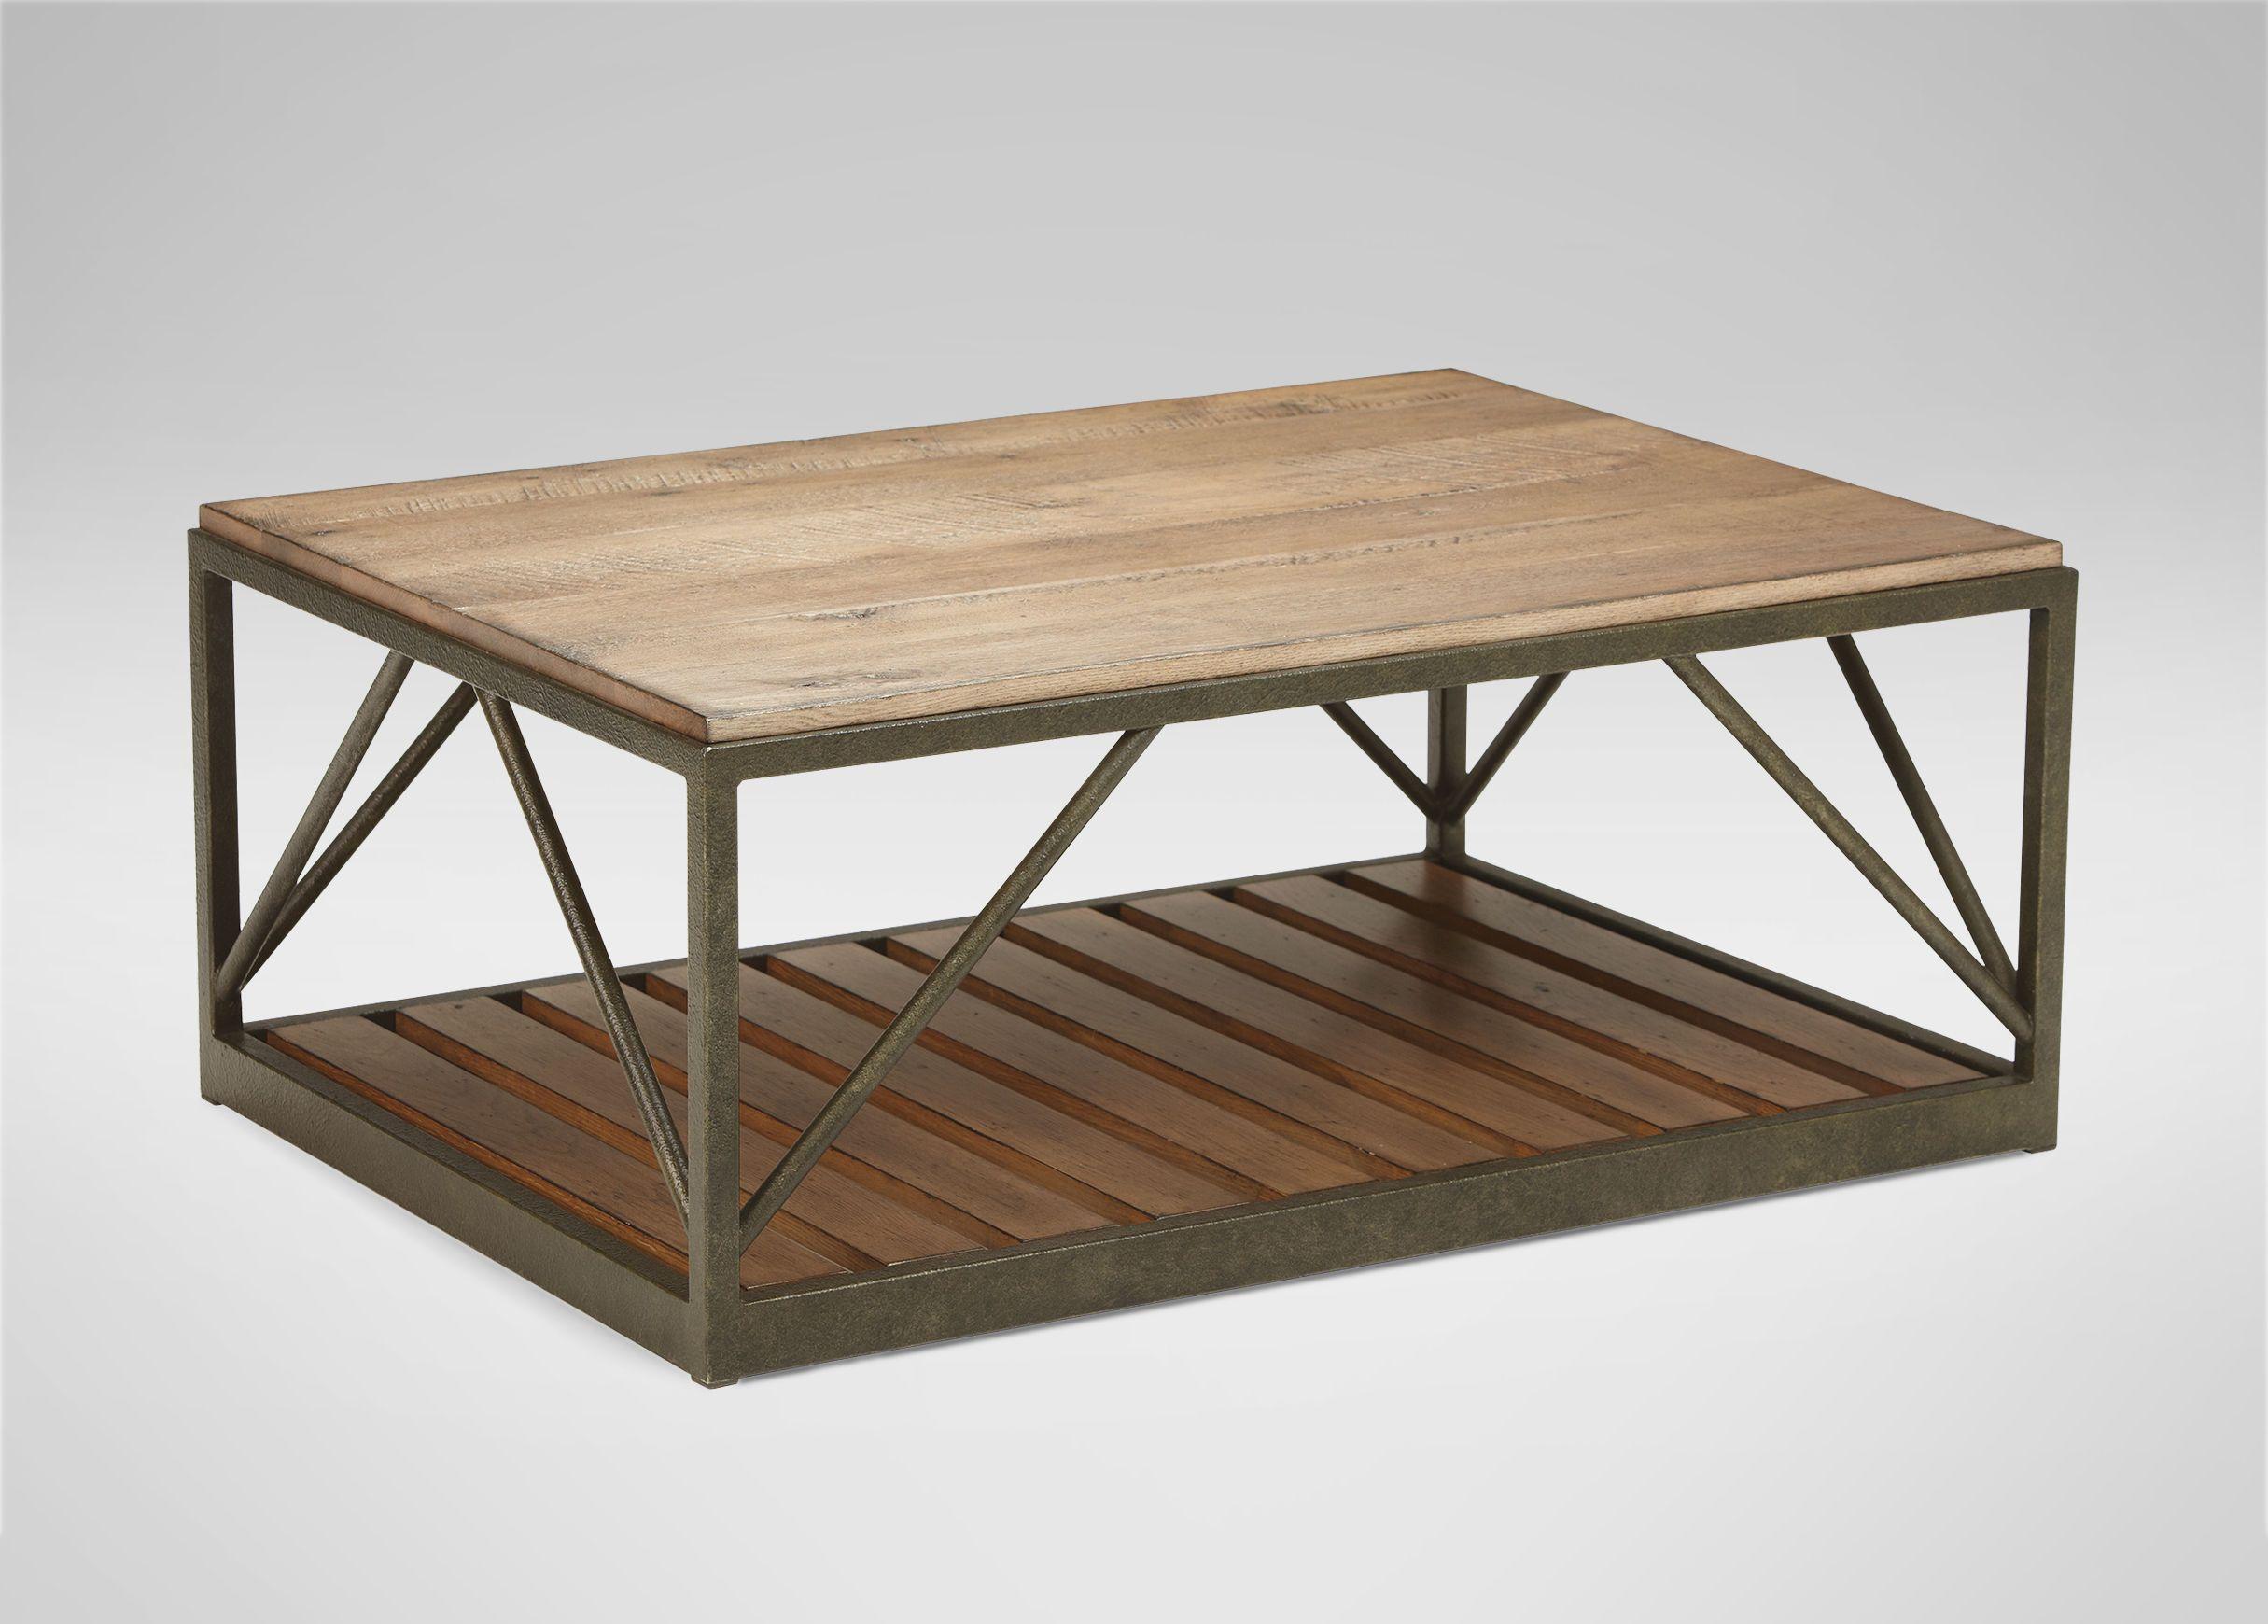 Beam Metal Base Coffee Table Metal Wood Coffee Table Small